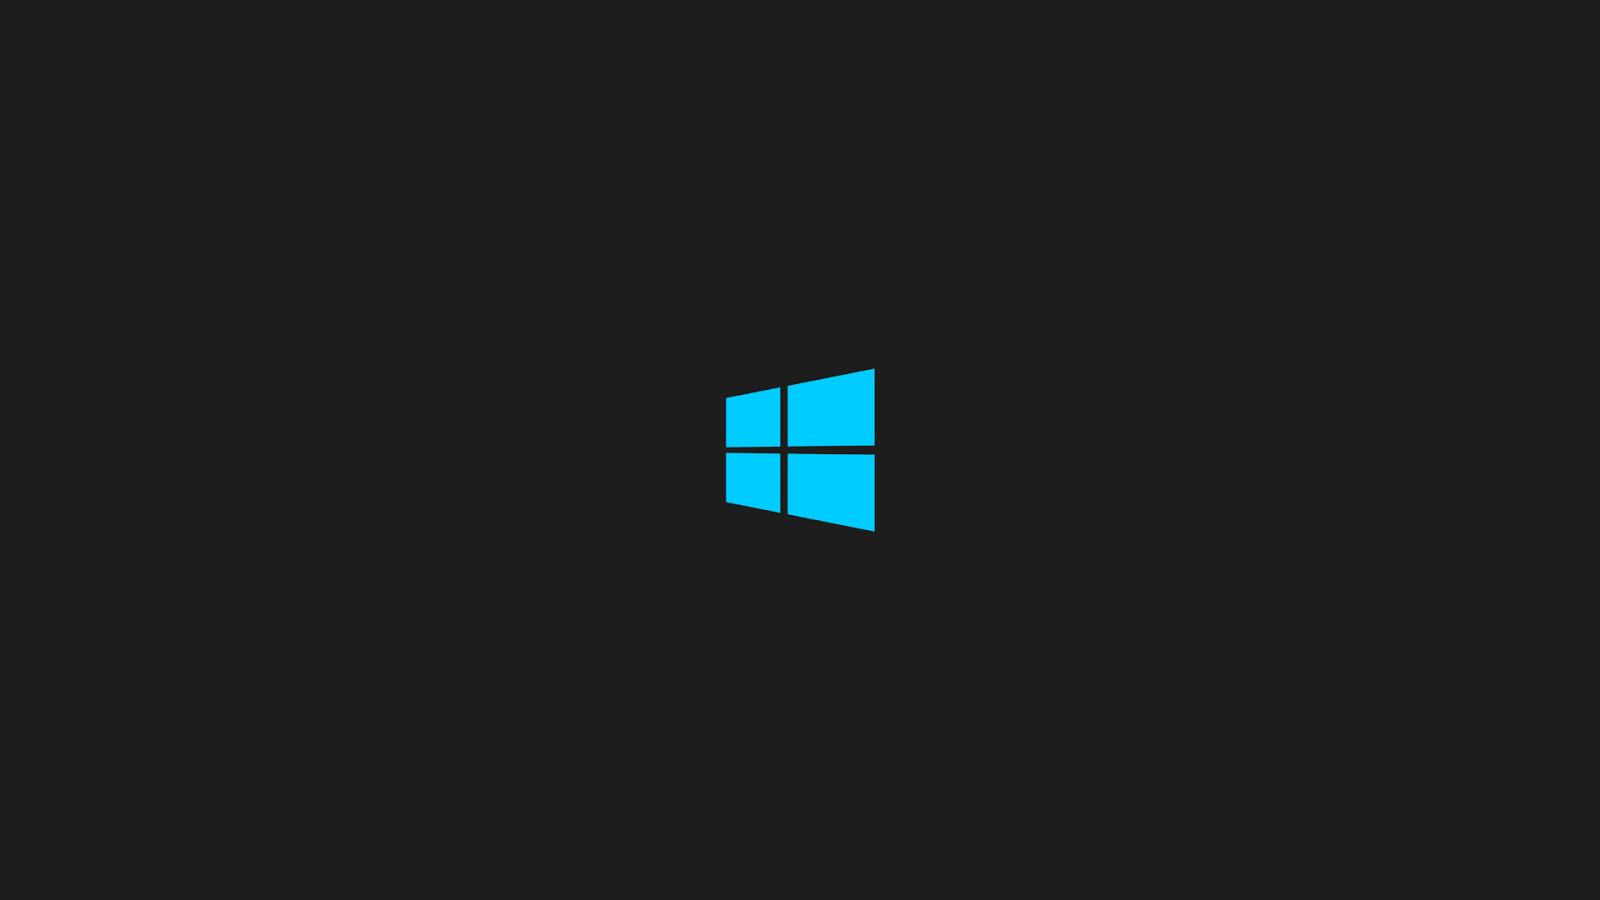 windows 8 backgrounds and wallpaper - wallpapersafari